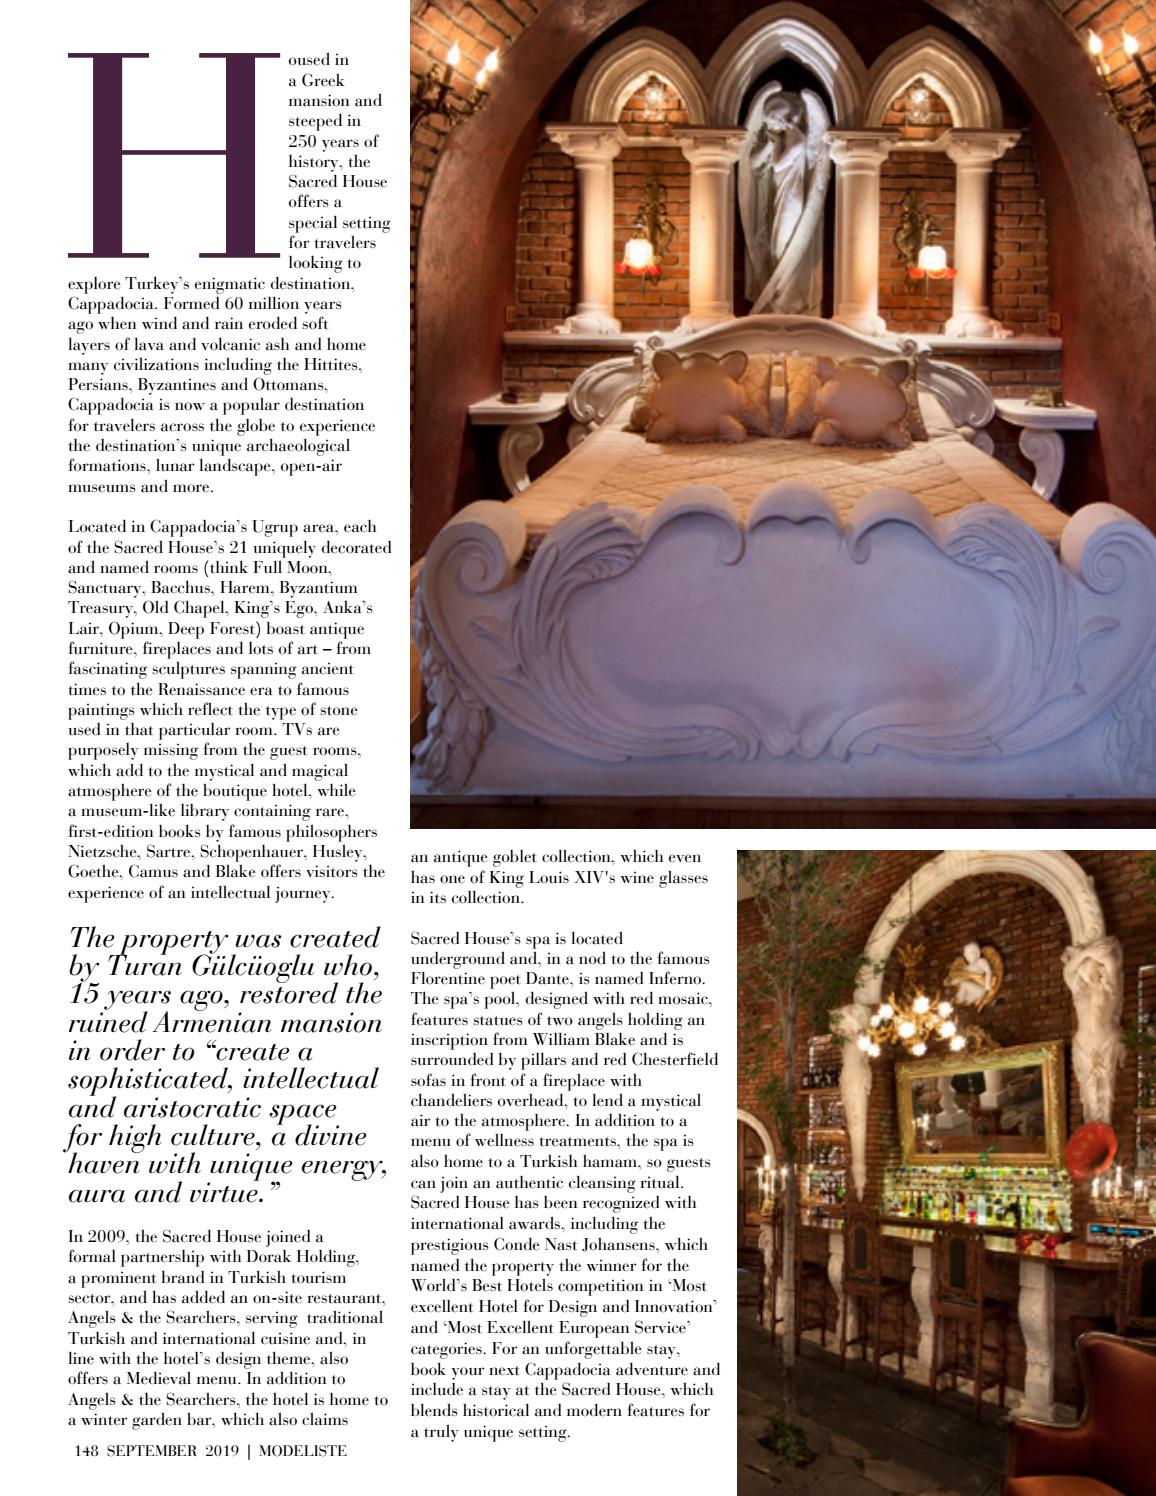 William Blake Chesterfield Sofa modeliste magazine: victoria justice issuemodeliste